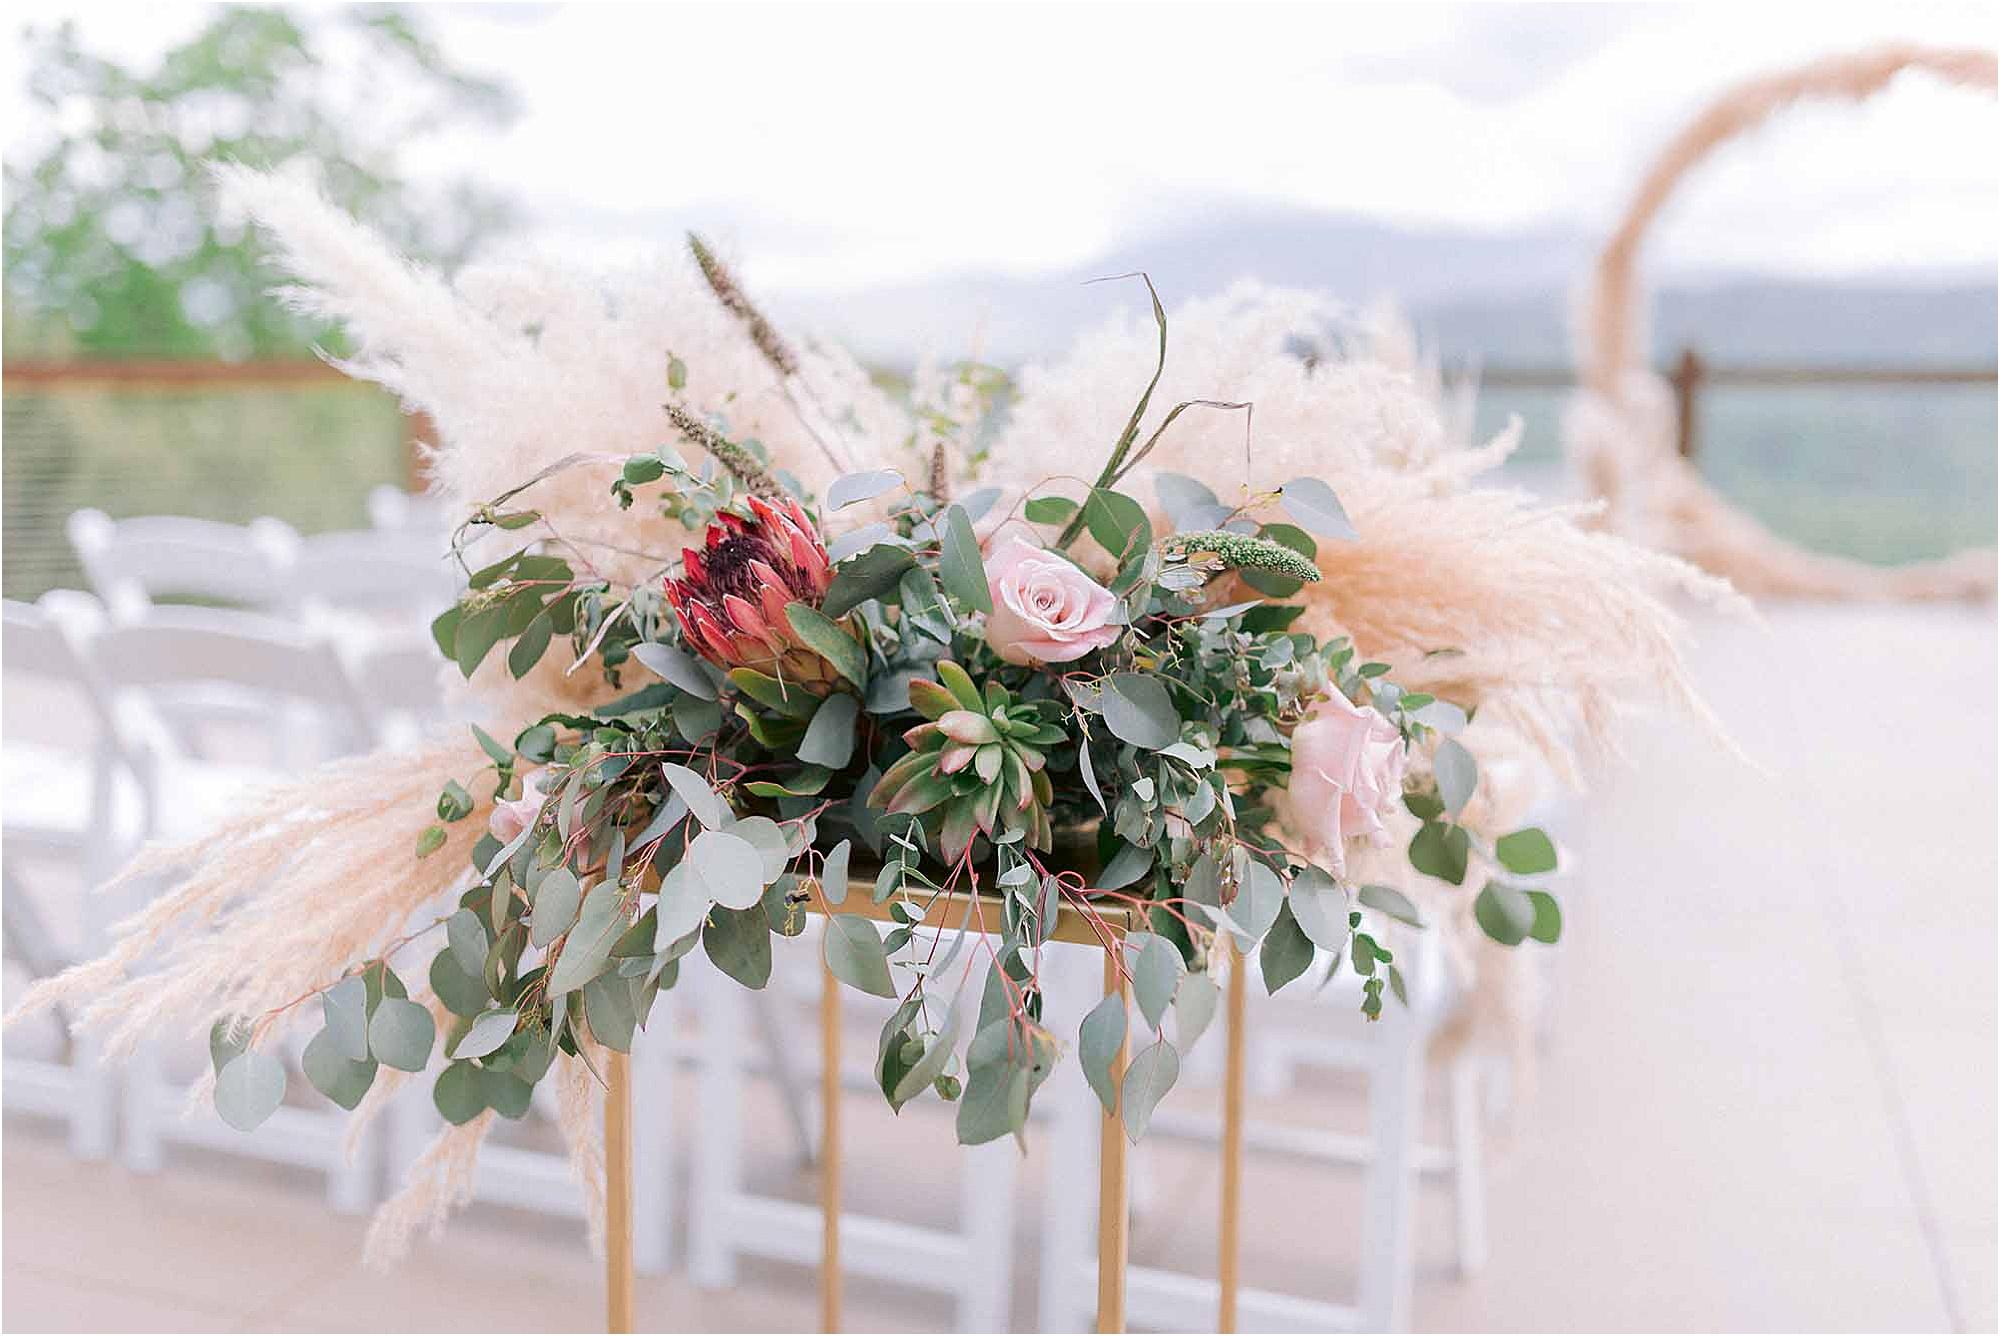 pink and gold flower arrangement at wedding ceremony